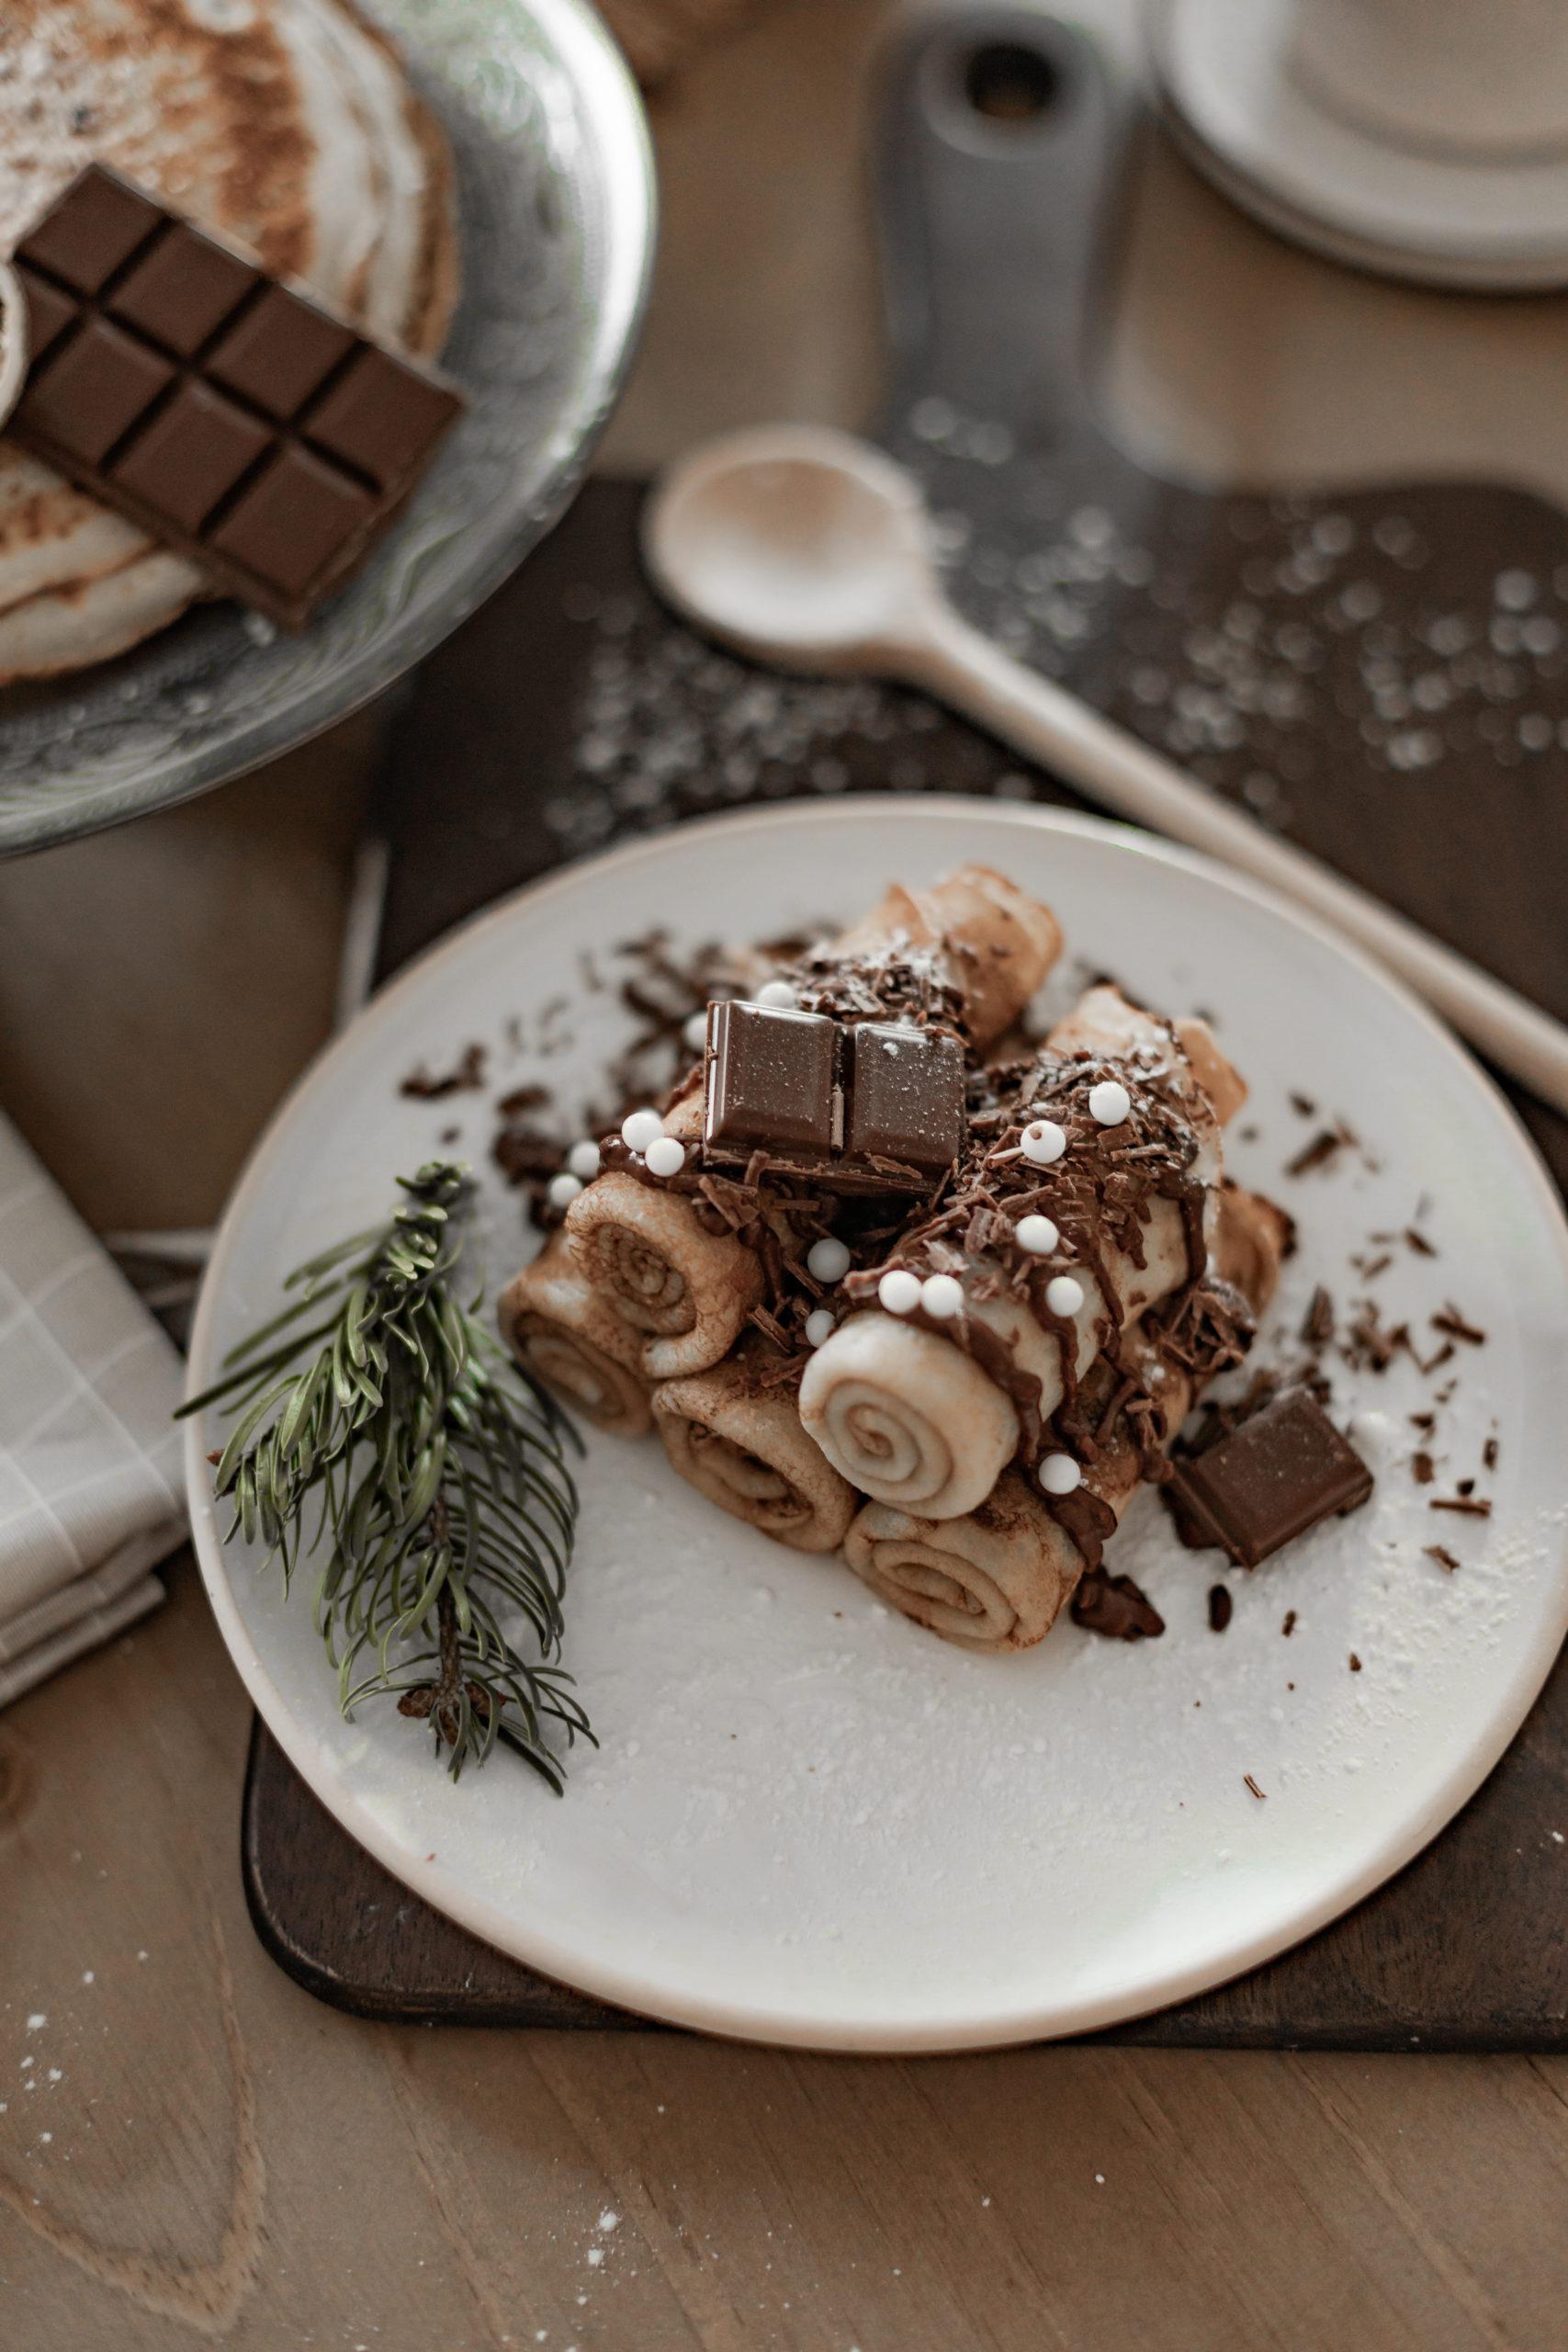 Crêpes maison au chocolat fondu